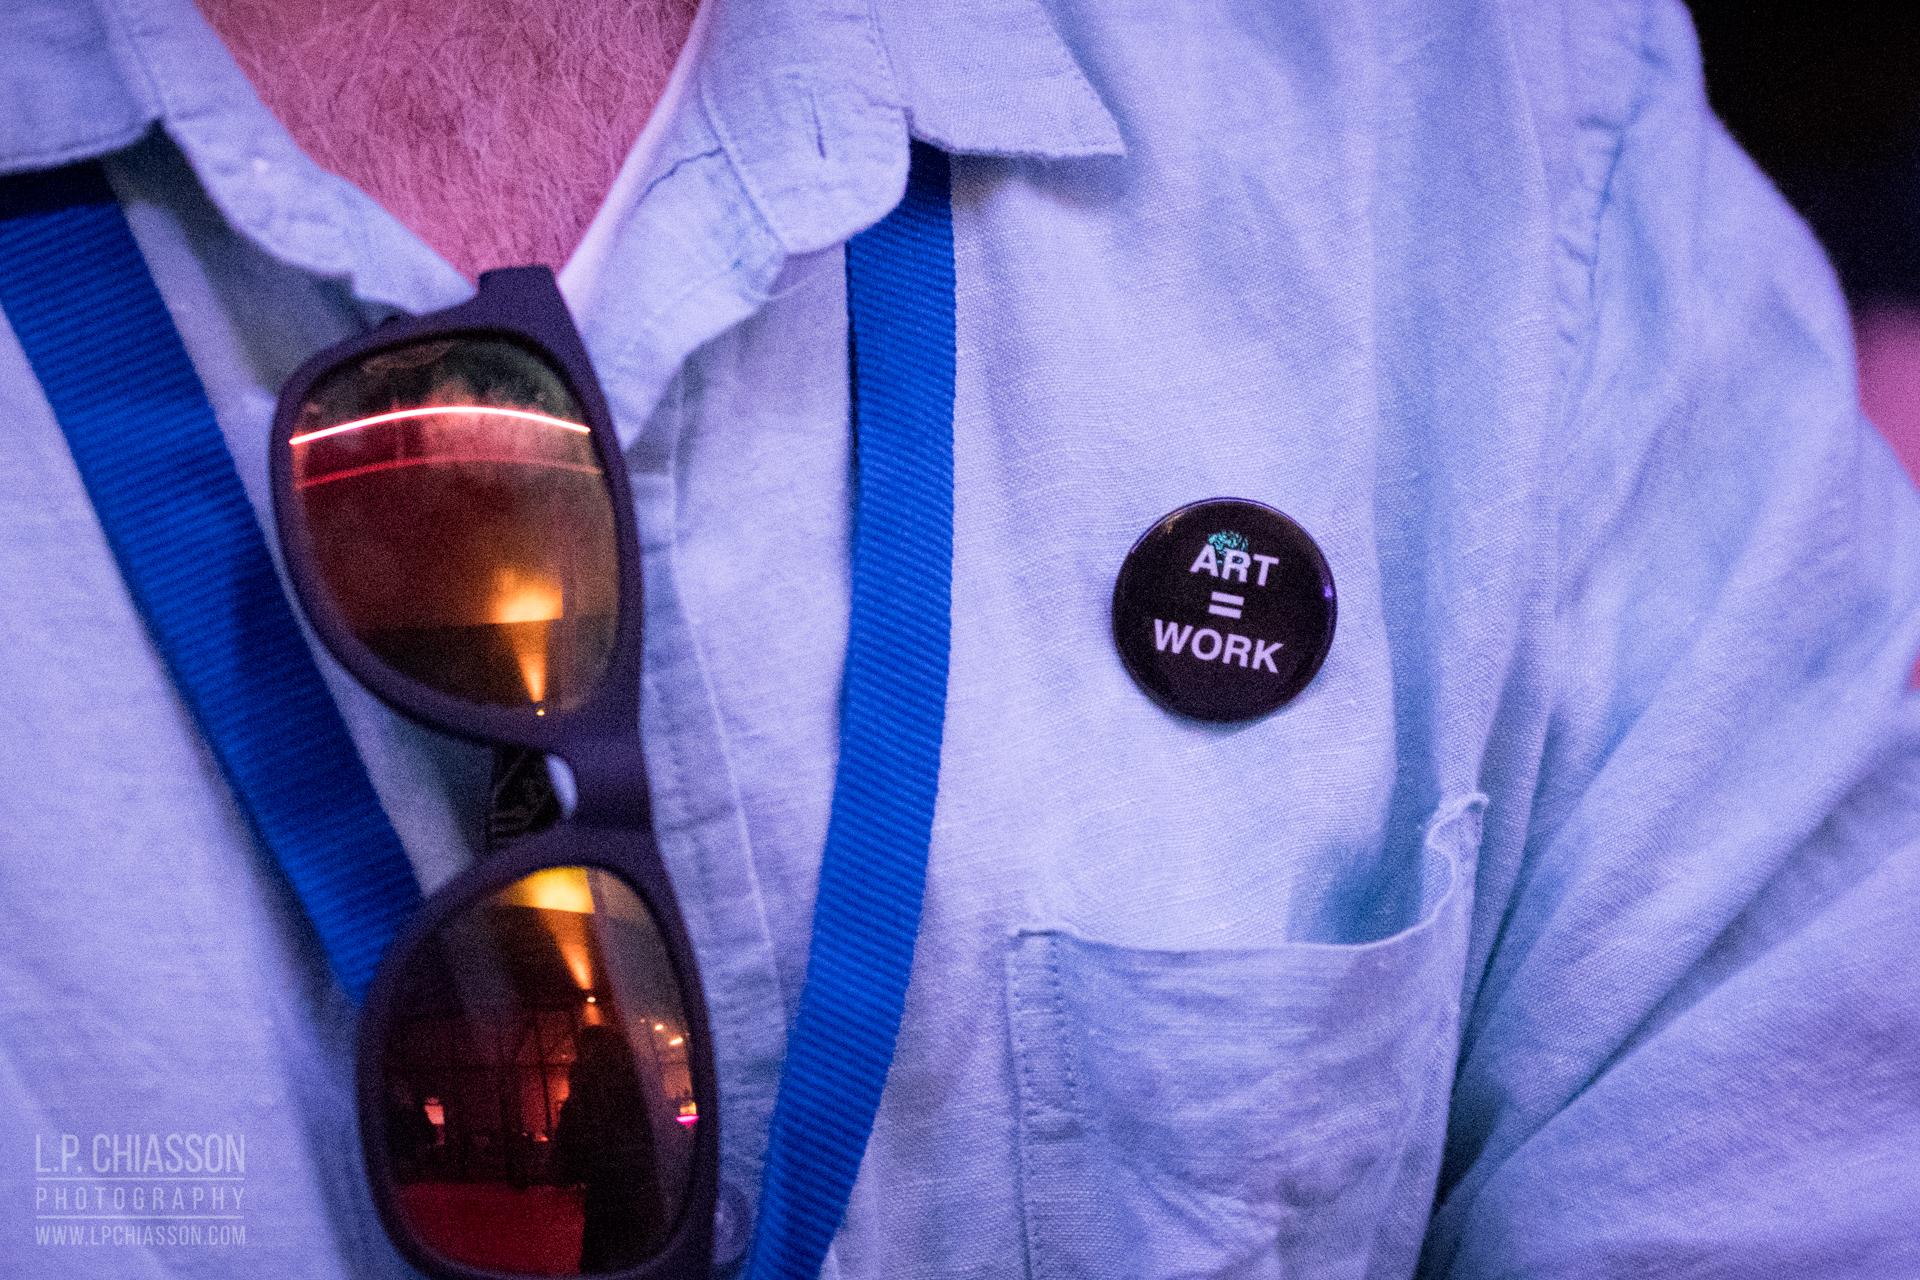 Flotilla delegate at opening reception, wearing an ART=WORK pin. Photo: LP Chiasson & Festival Inspire.